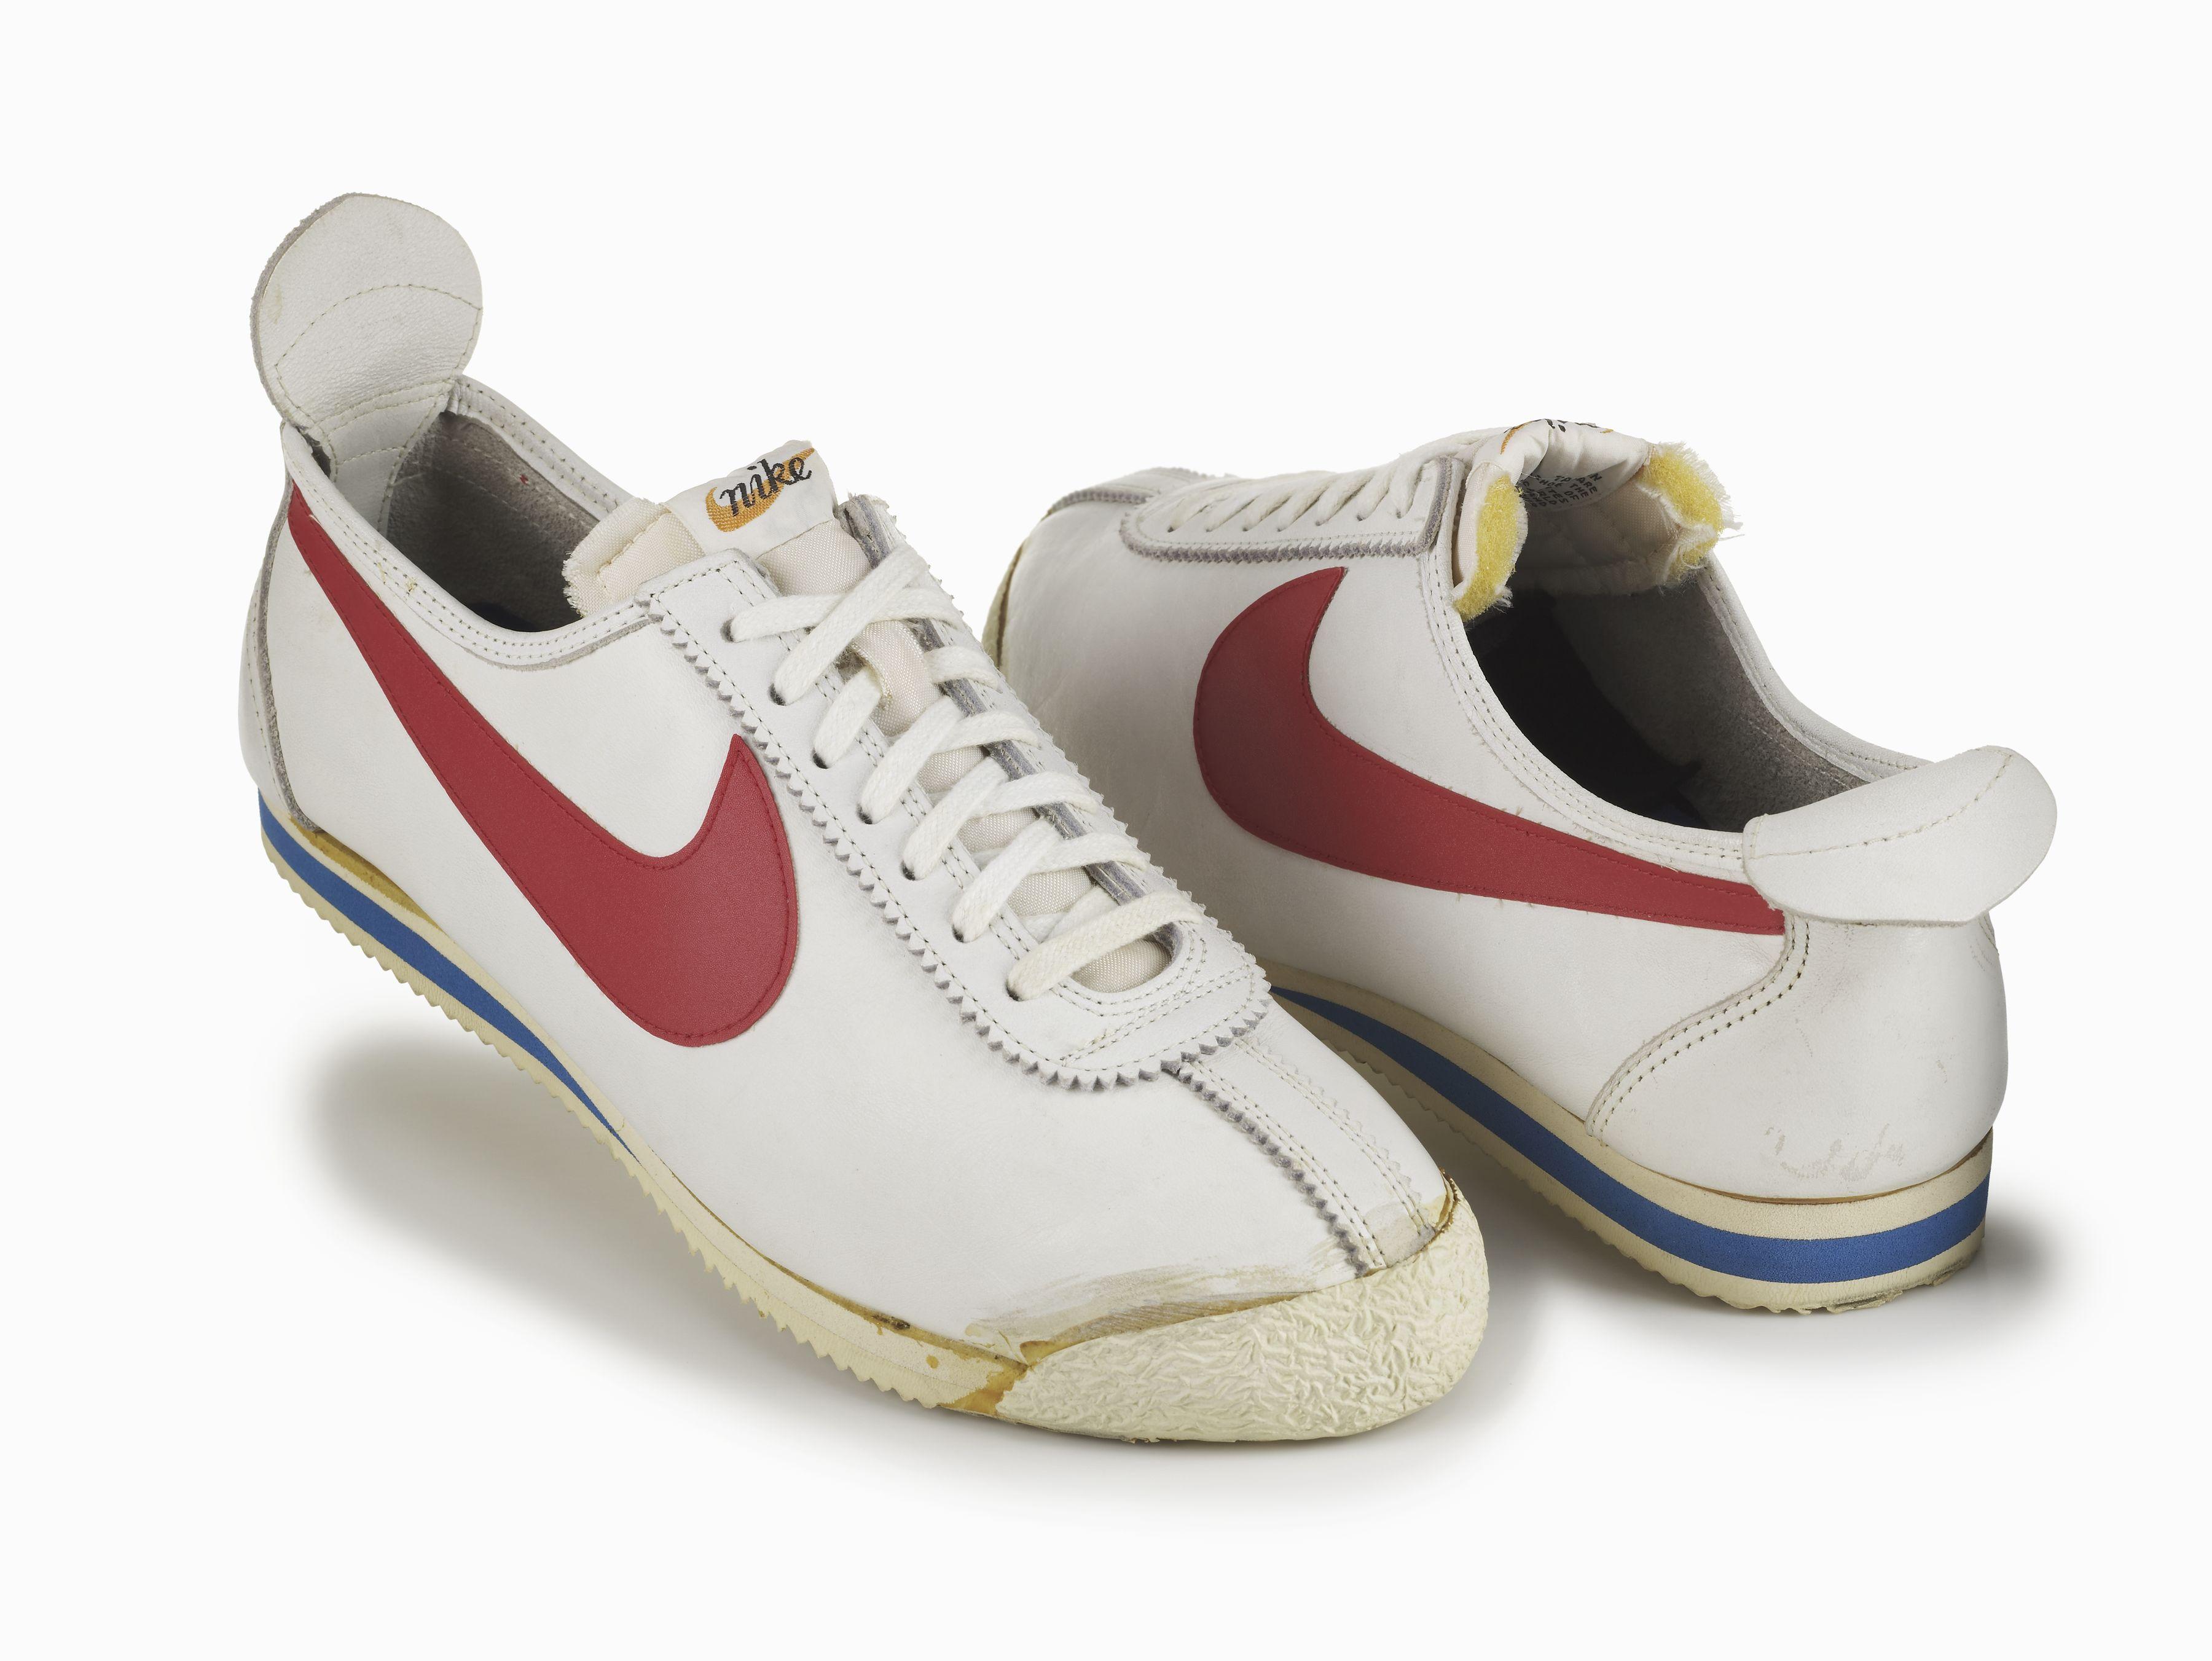 Nike Air Max Mens Shoe Size 11.5 Finish Line  06f6e819a997